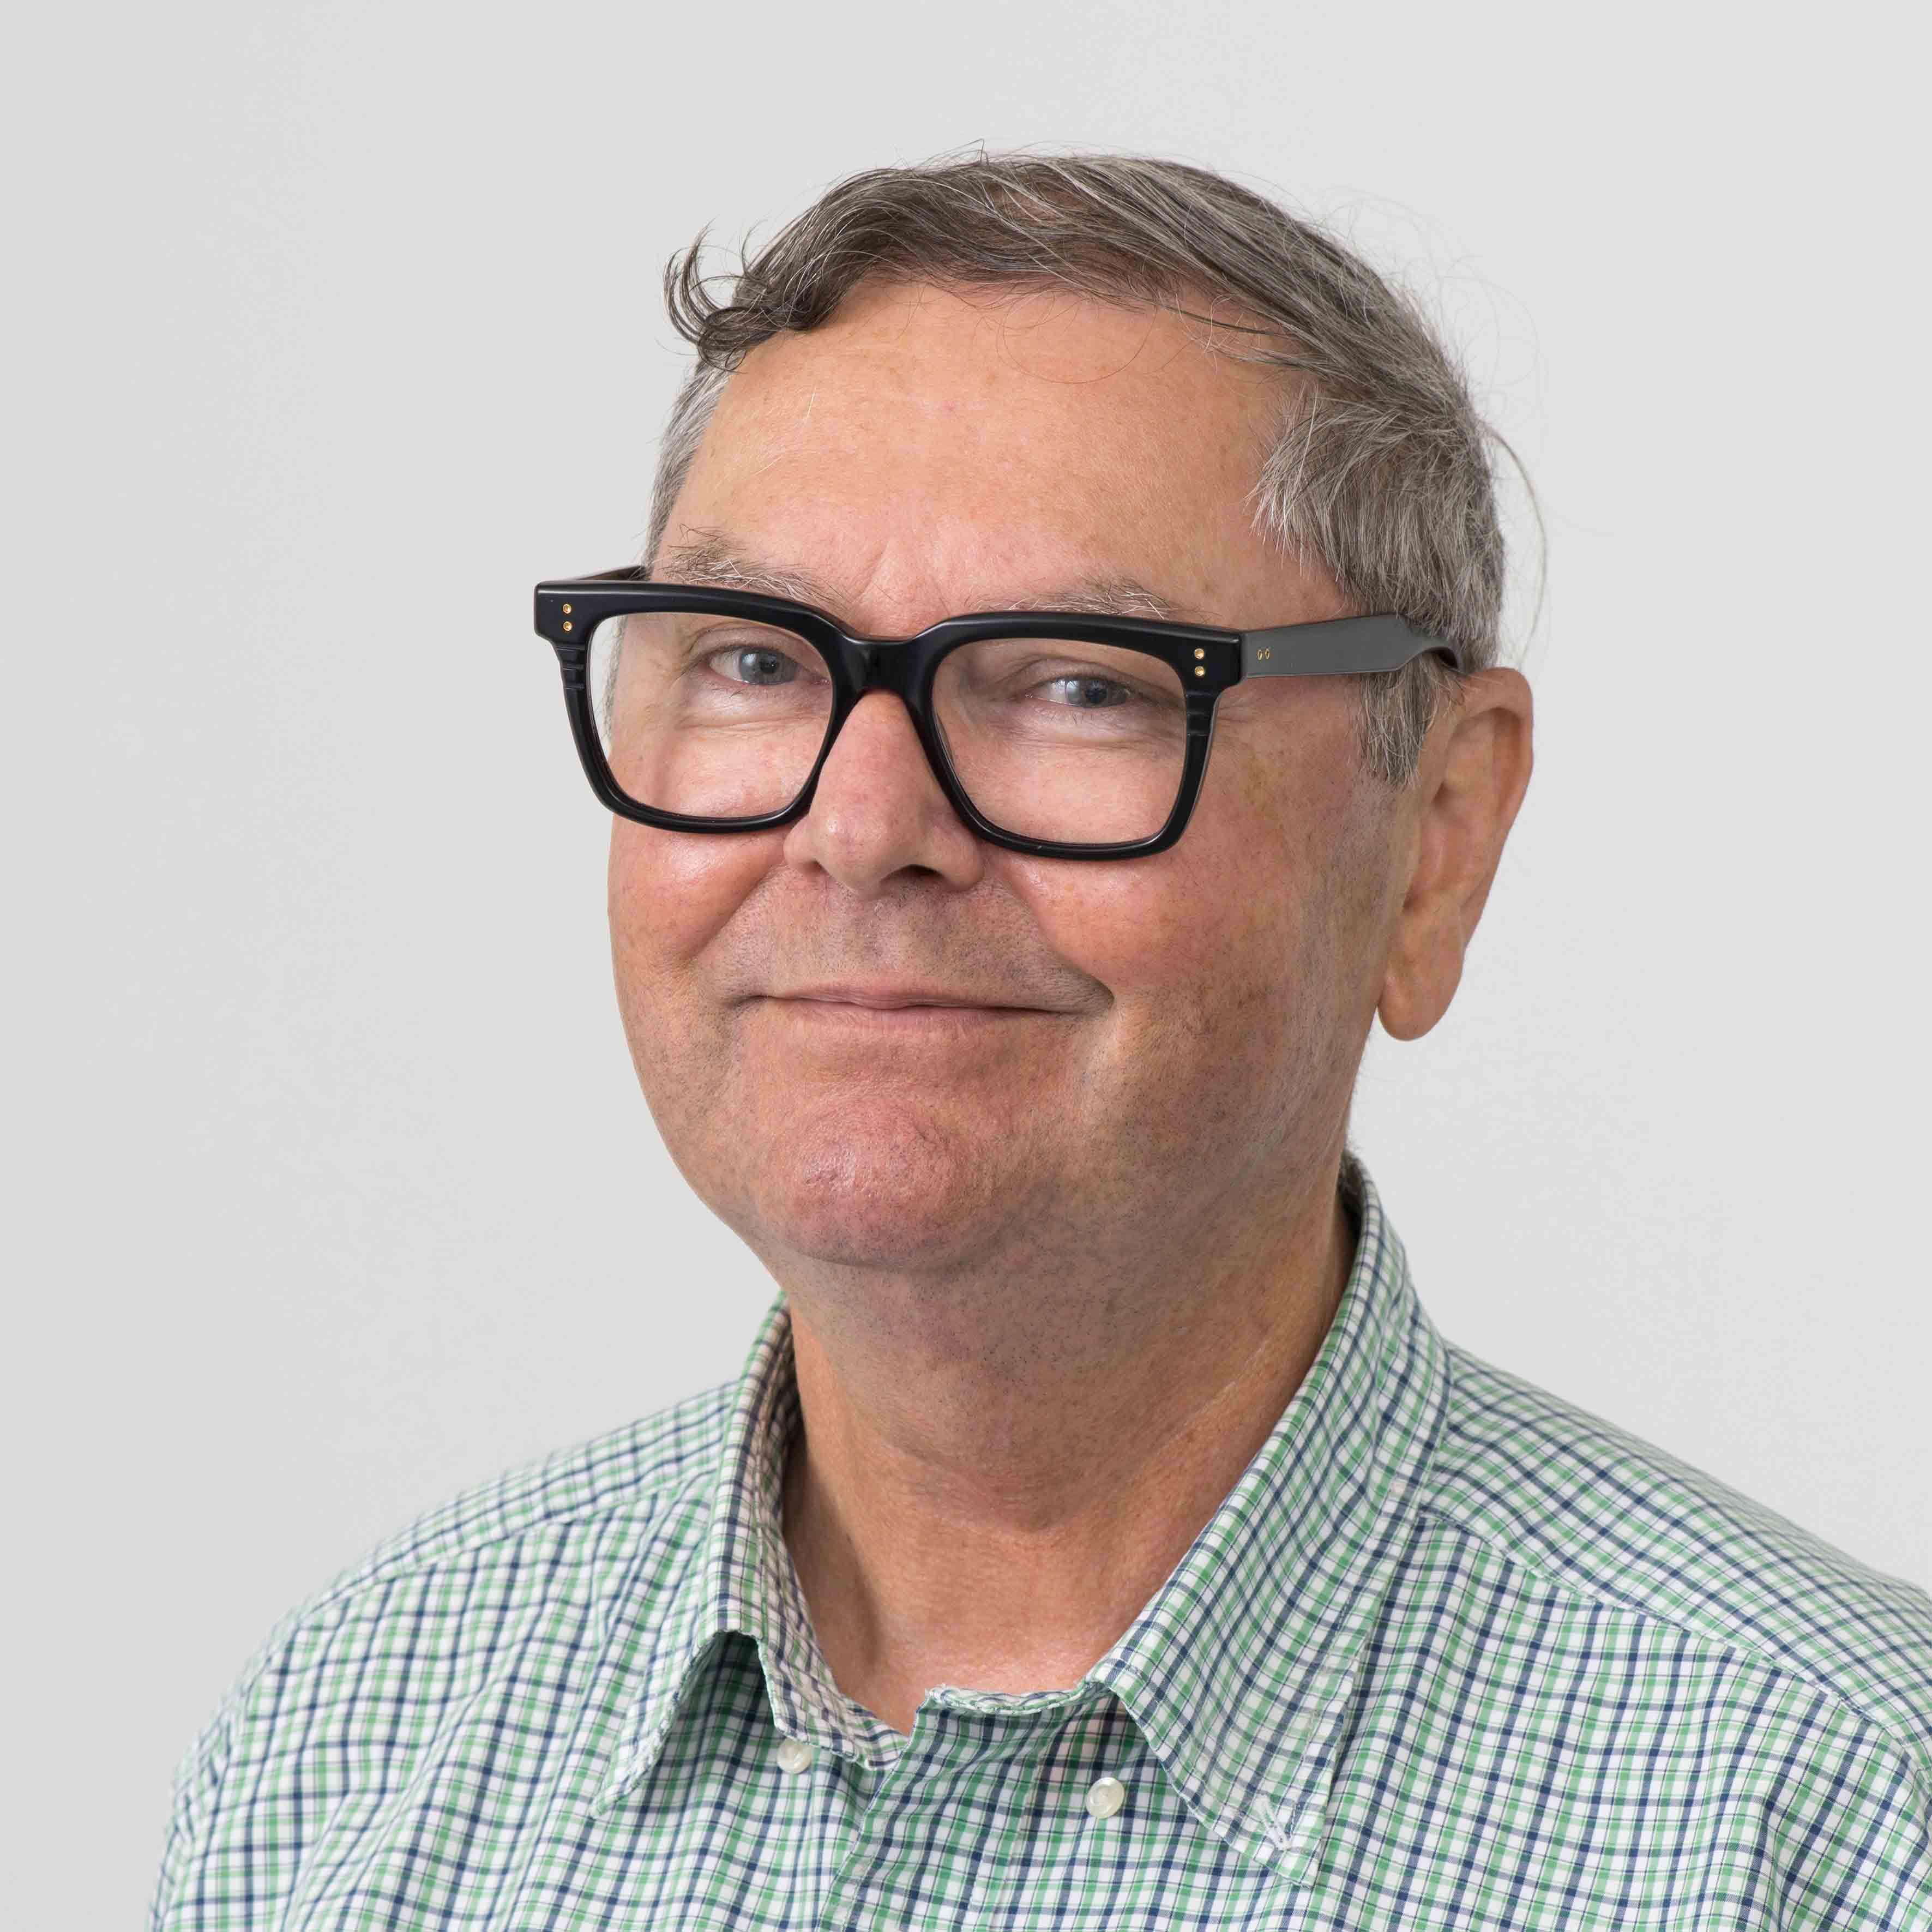 Lecture series Colin McCahon: Ron Brownson